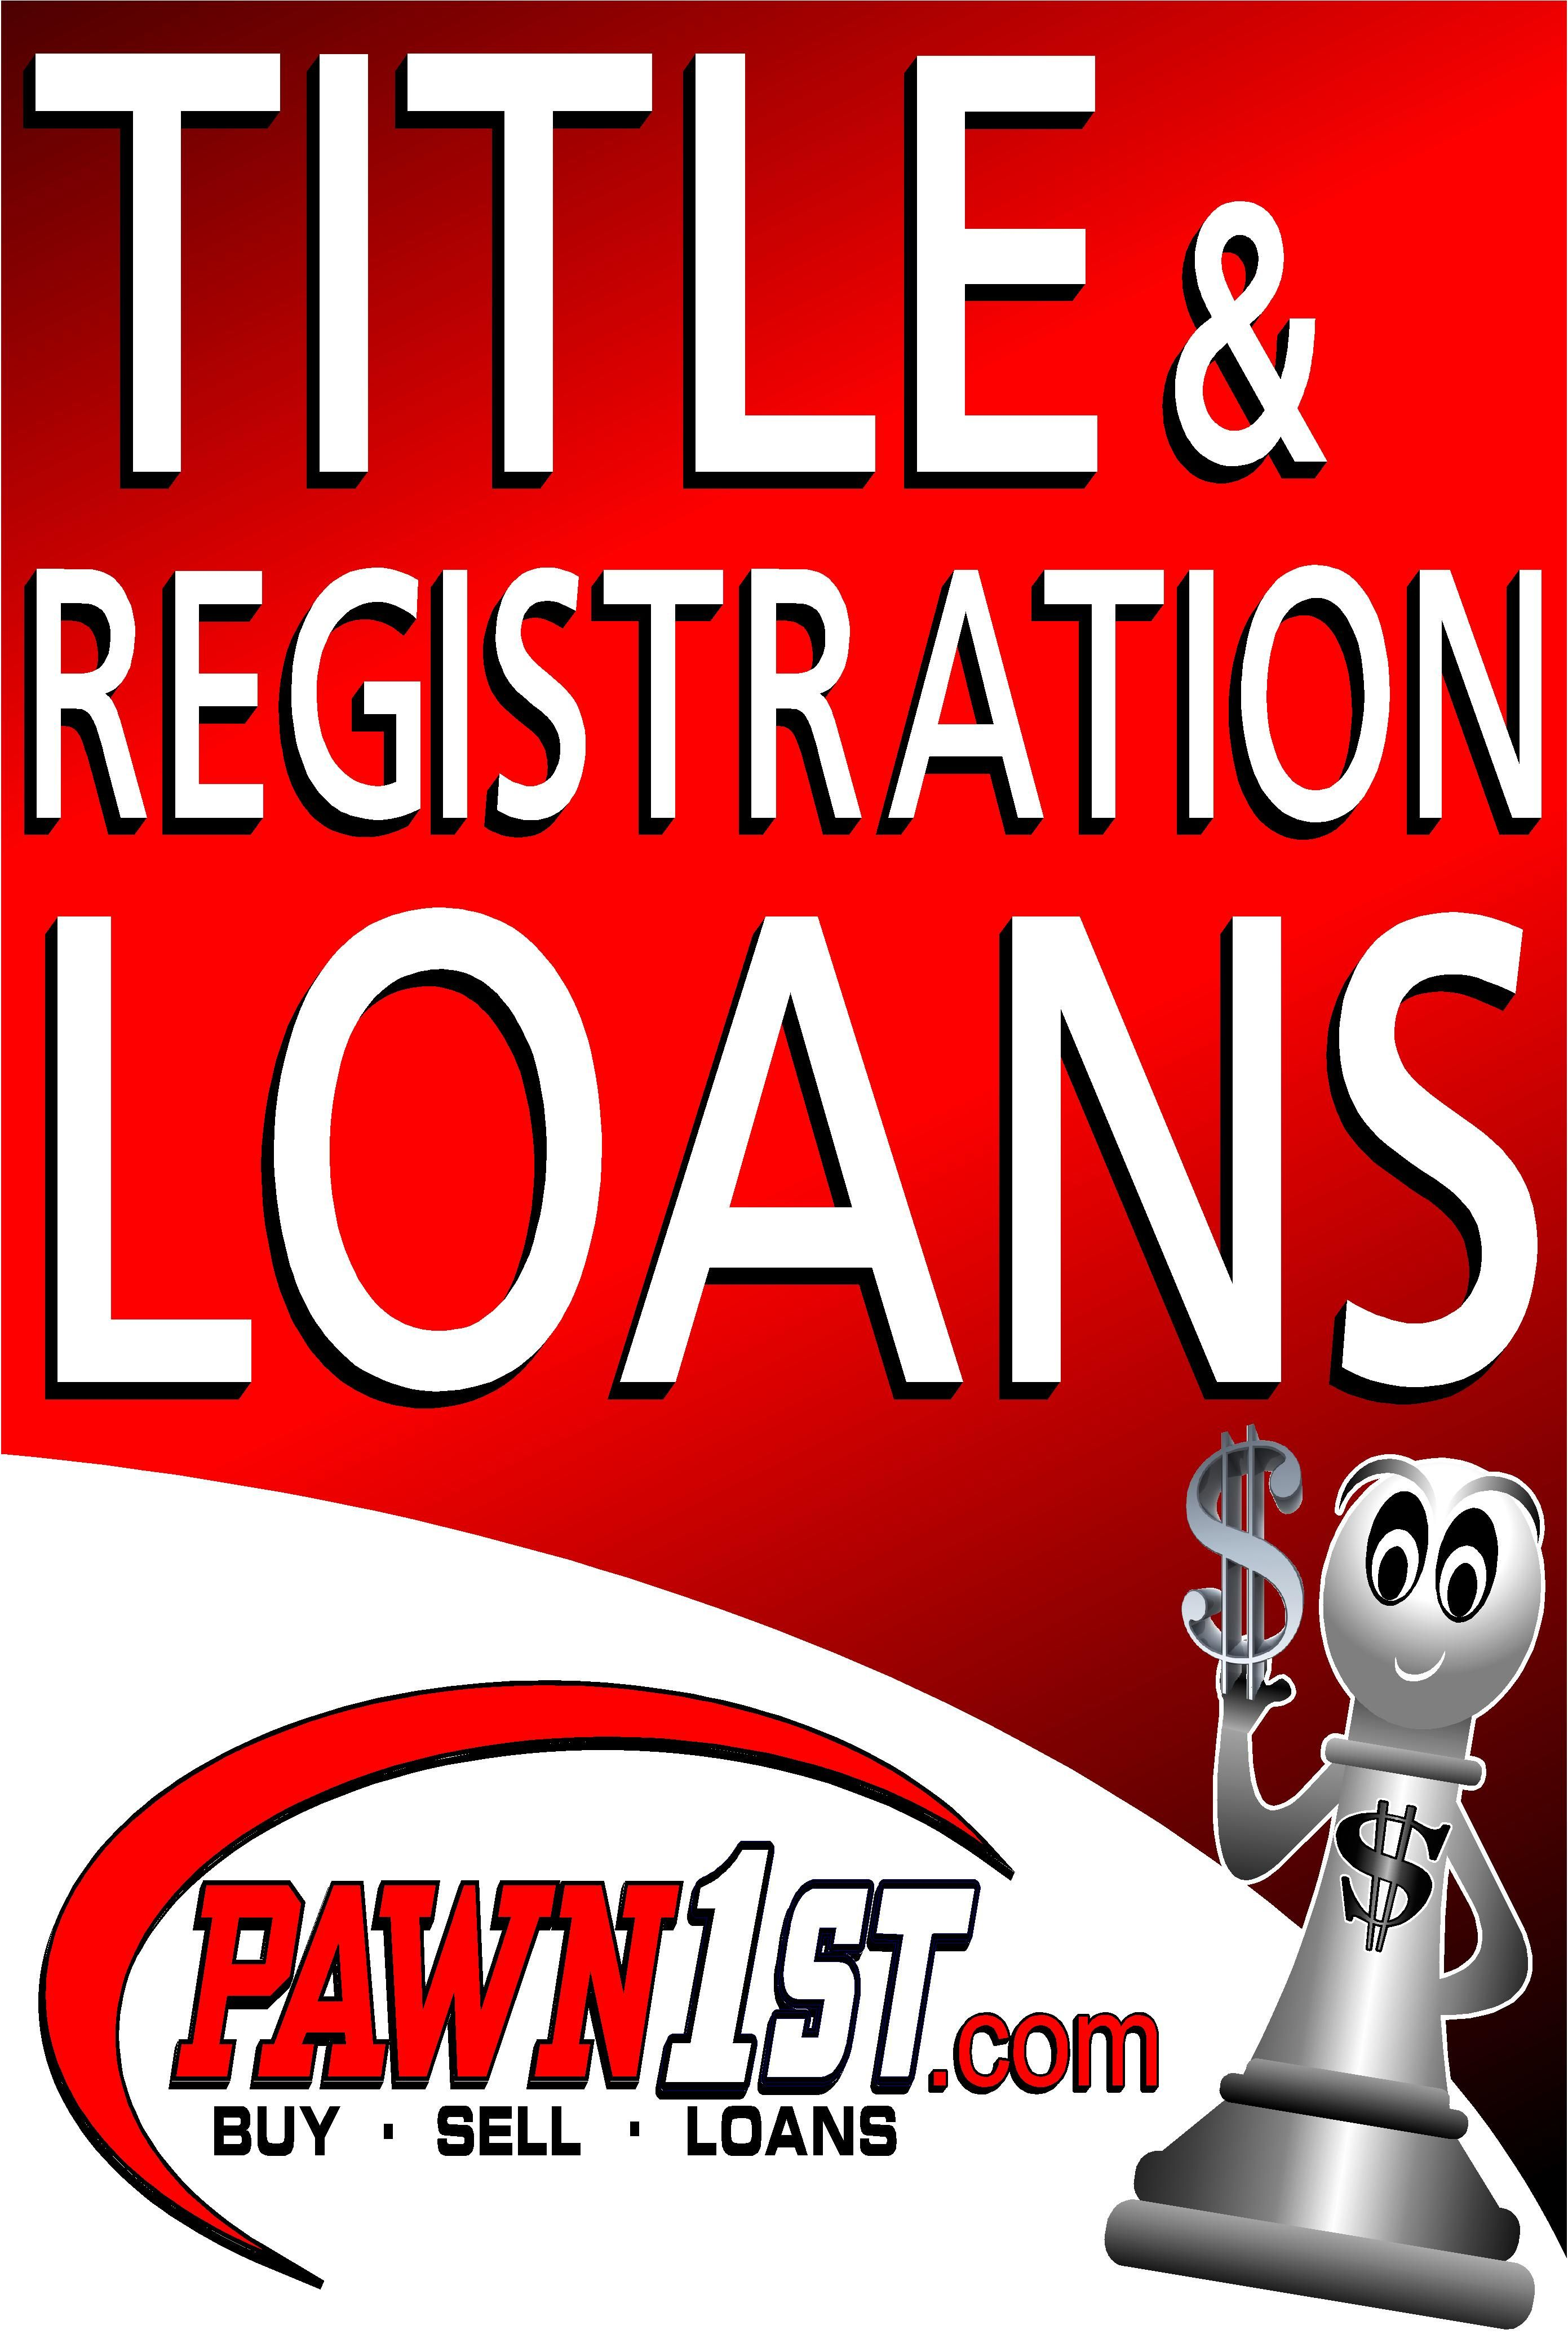 Auto Title Loans Phoenix Car loans, Phoenix, Car